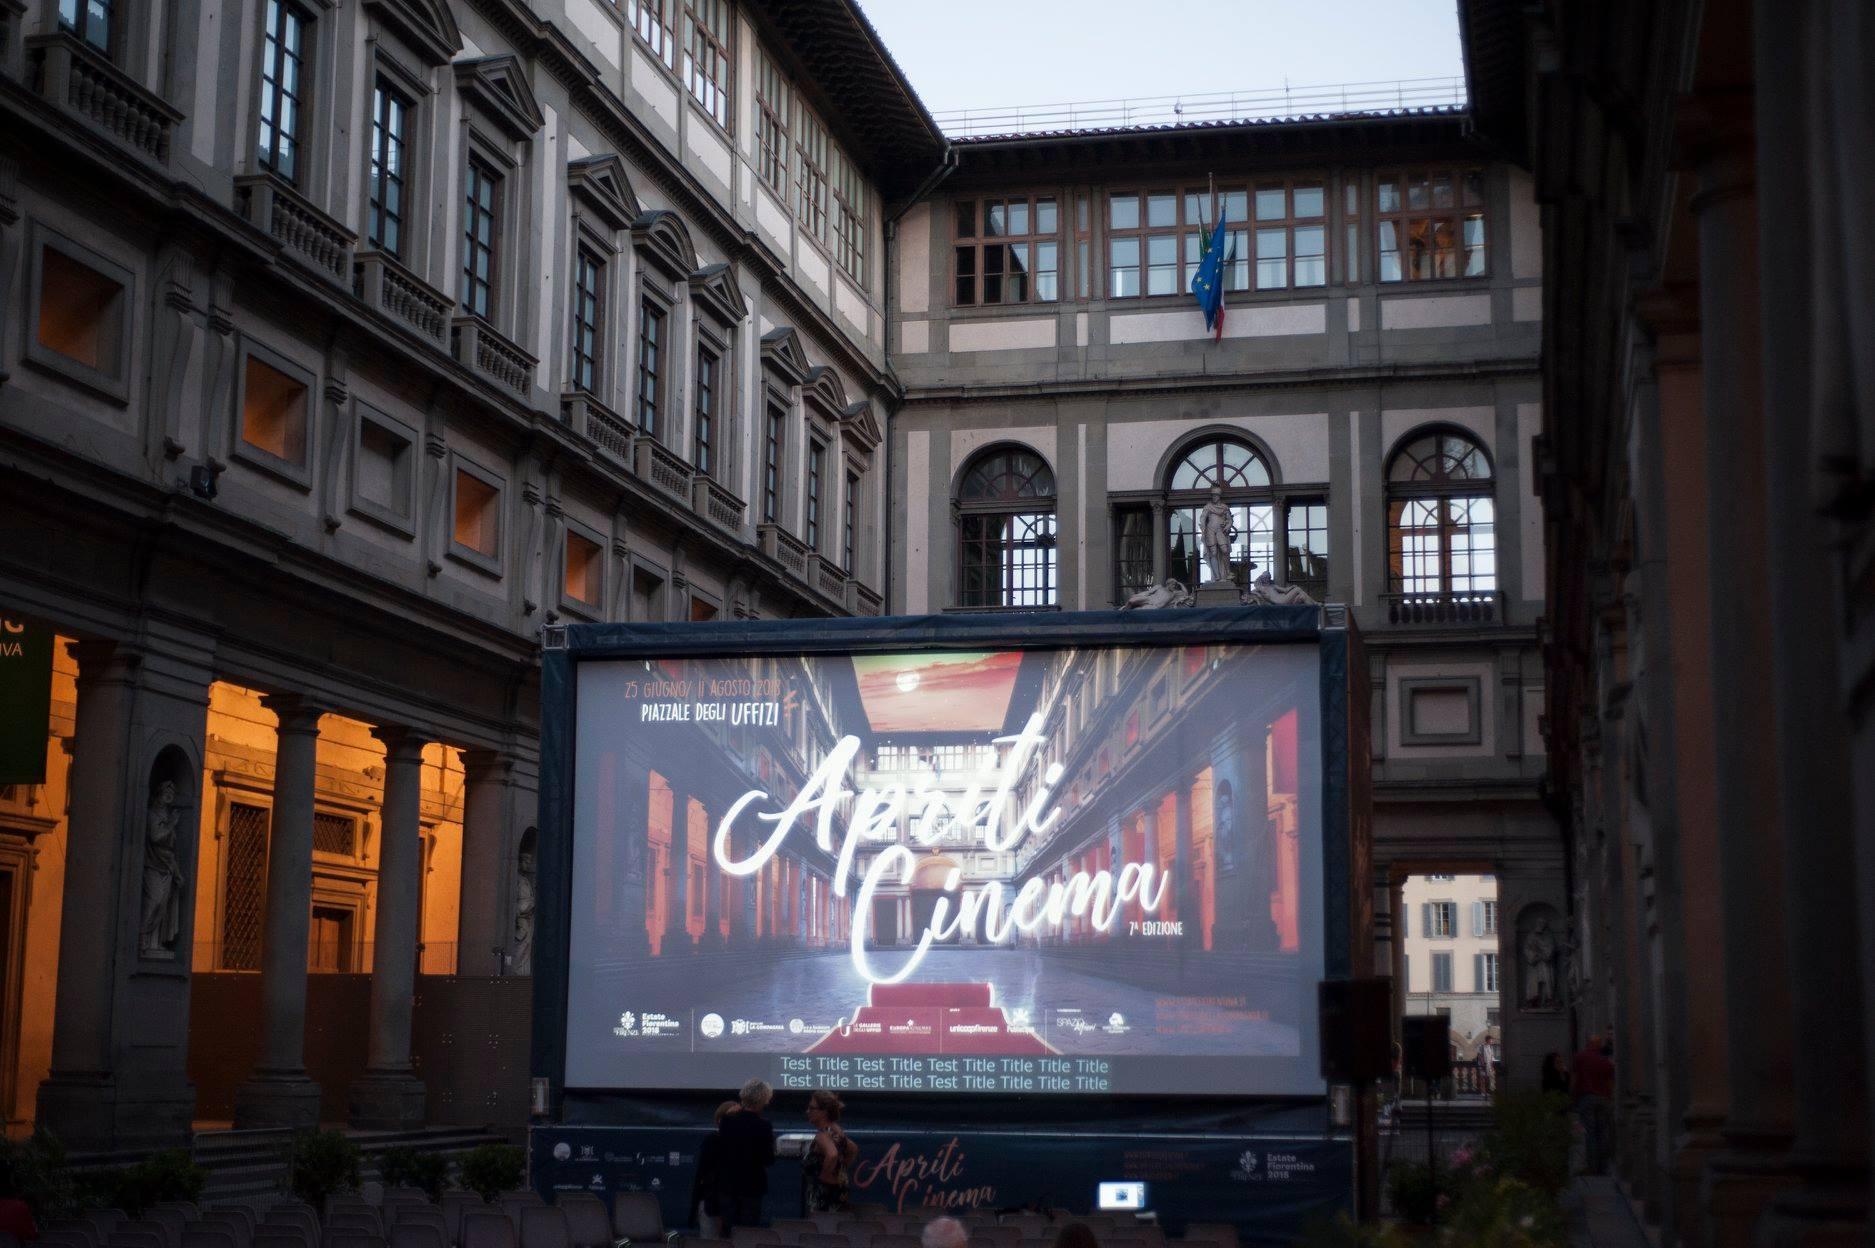 f085bed2c8ac Apriti Cinema a Firenze: si parte con Zeffirelli   Artribune